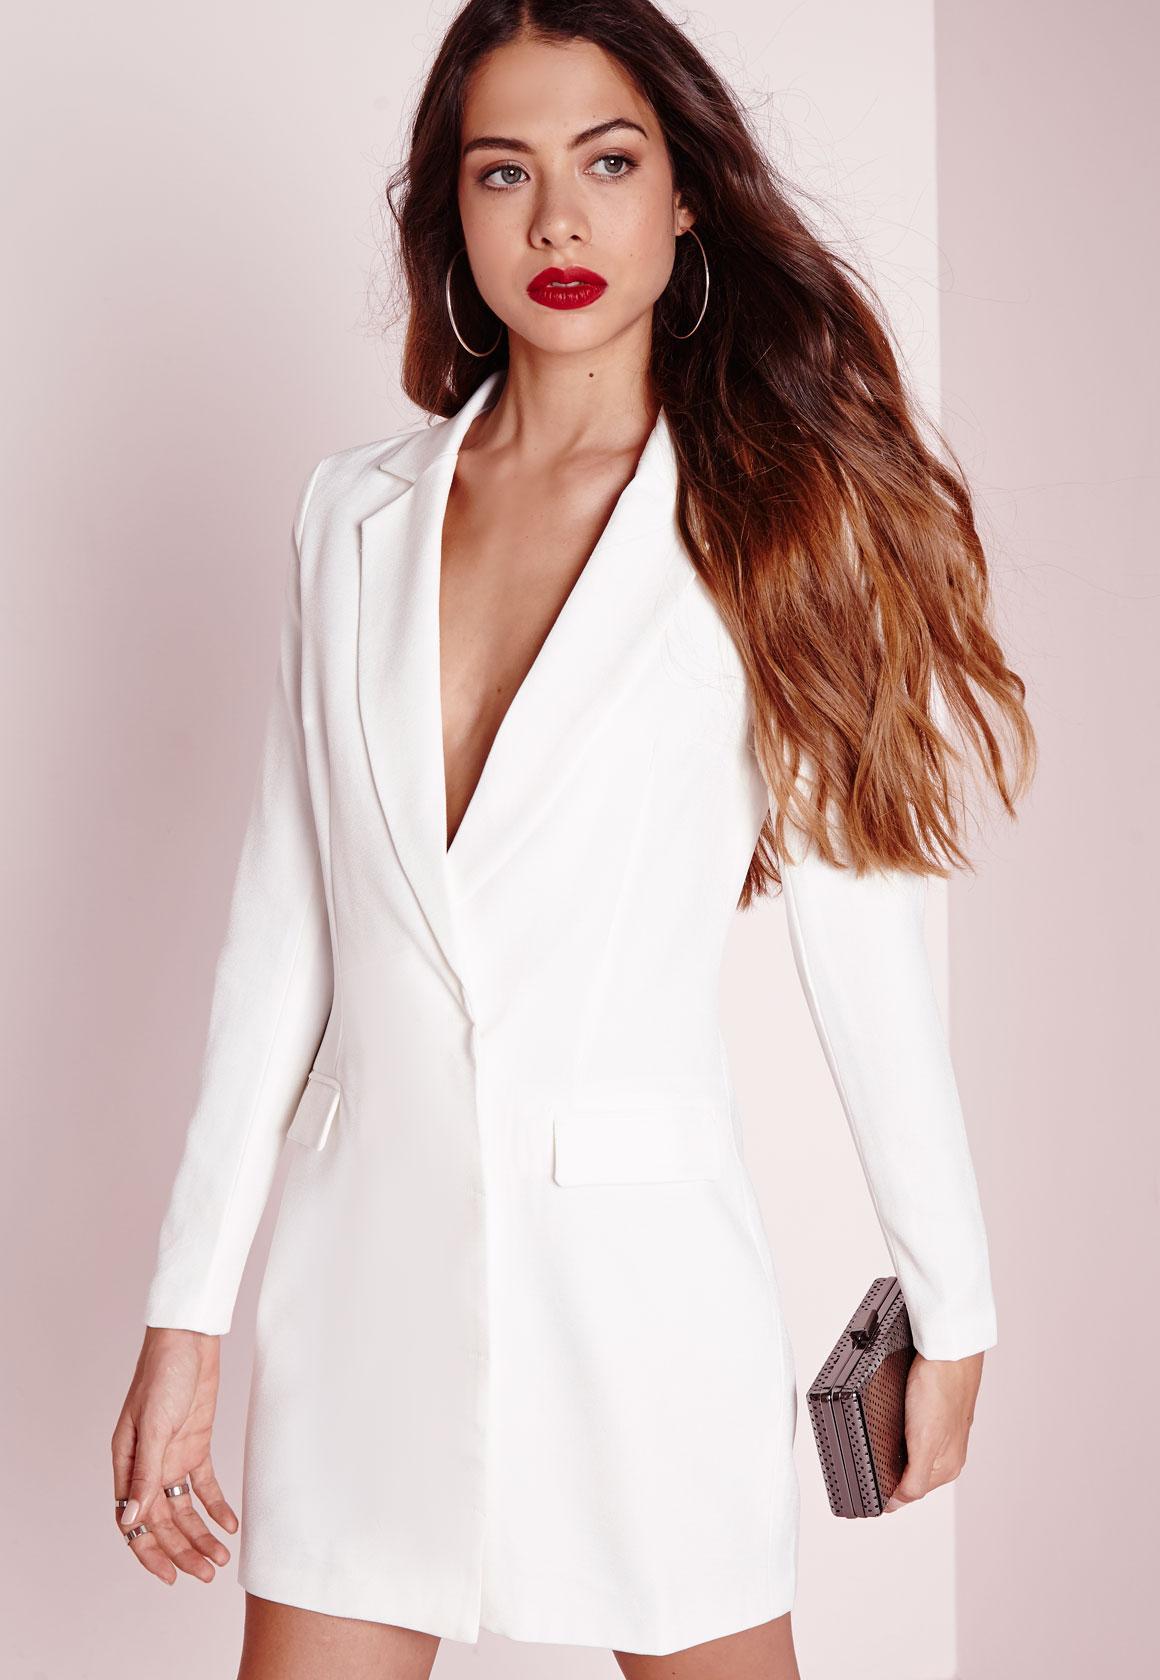 Stripe Blazer Dress - White Missguided zgIC4cFB9